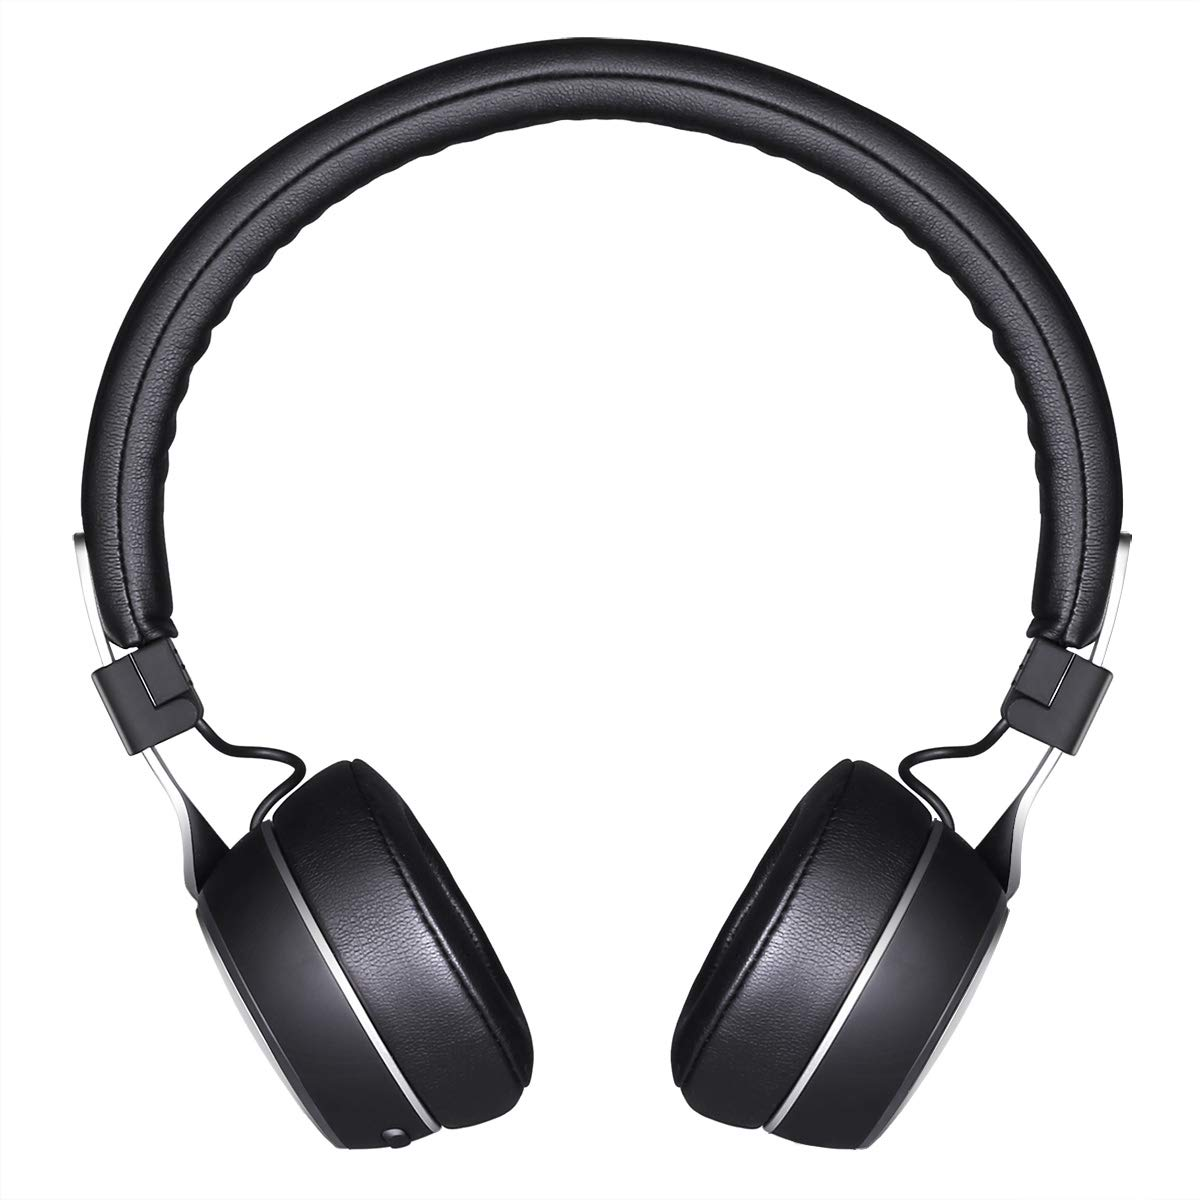 60% off Sunliking Noise Canceling Bluetooth Headphones with mid HI-FI Deep Bas